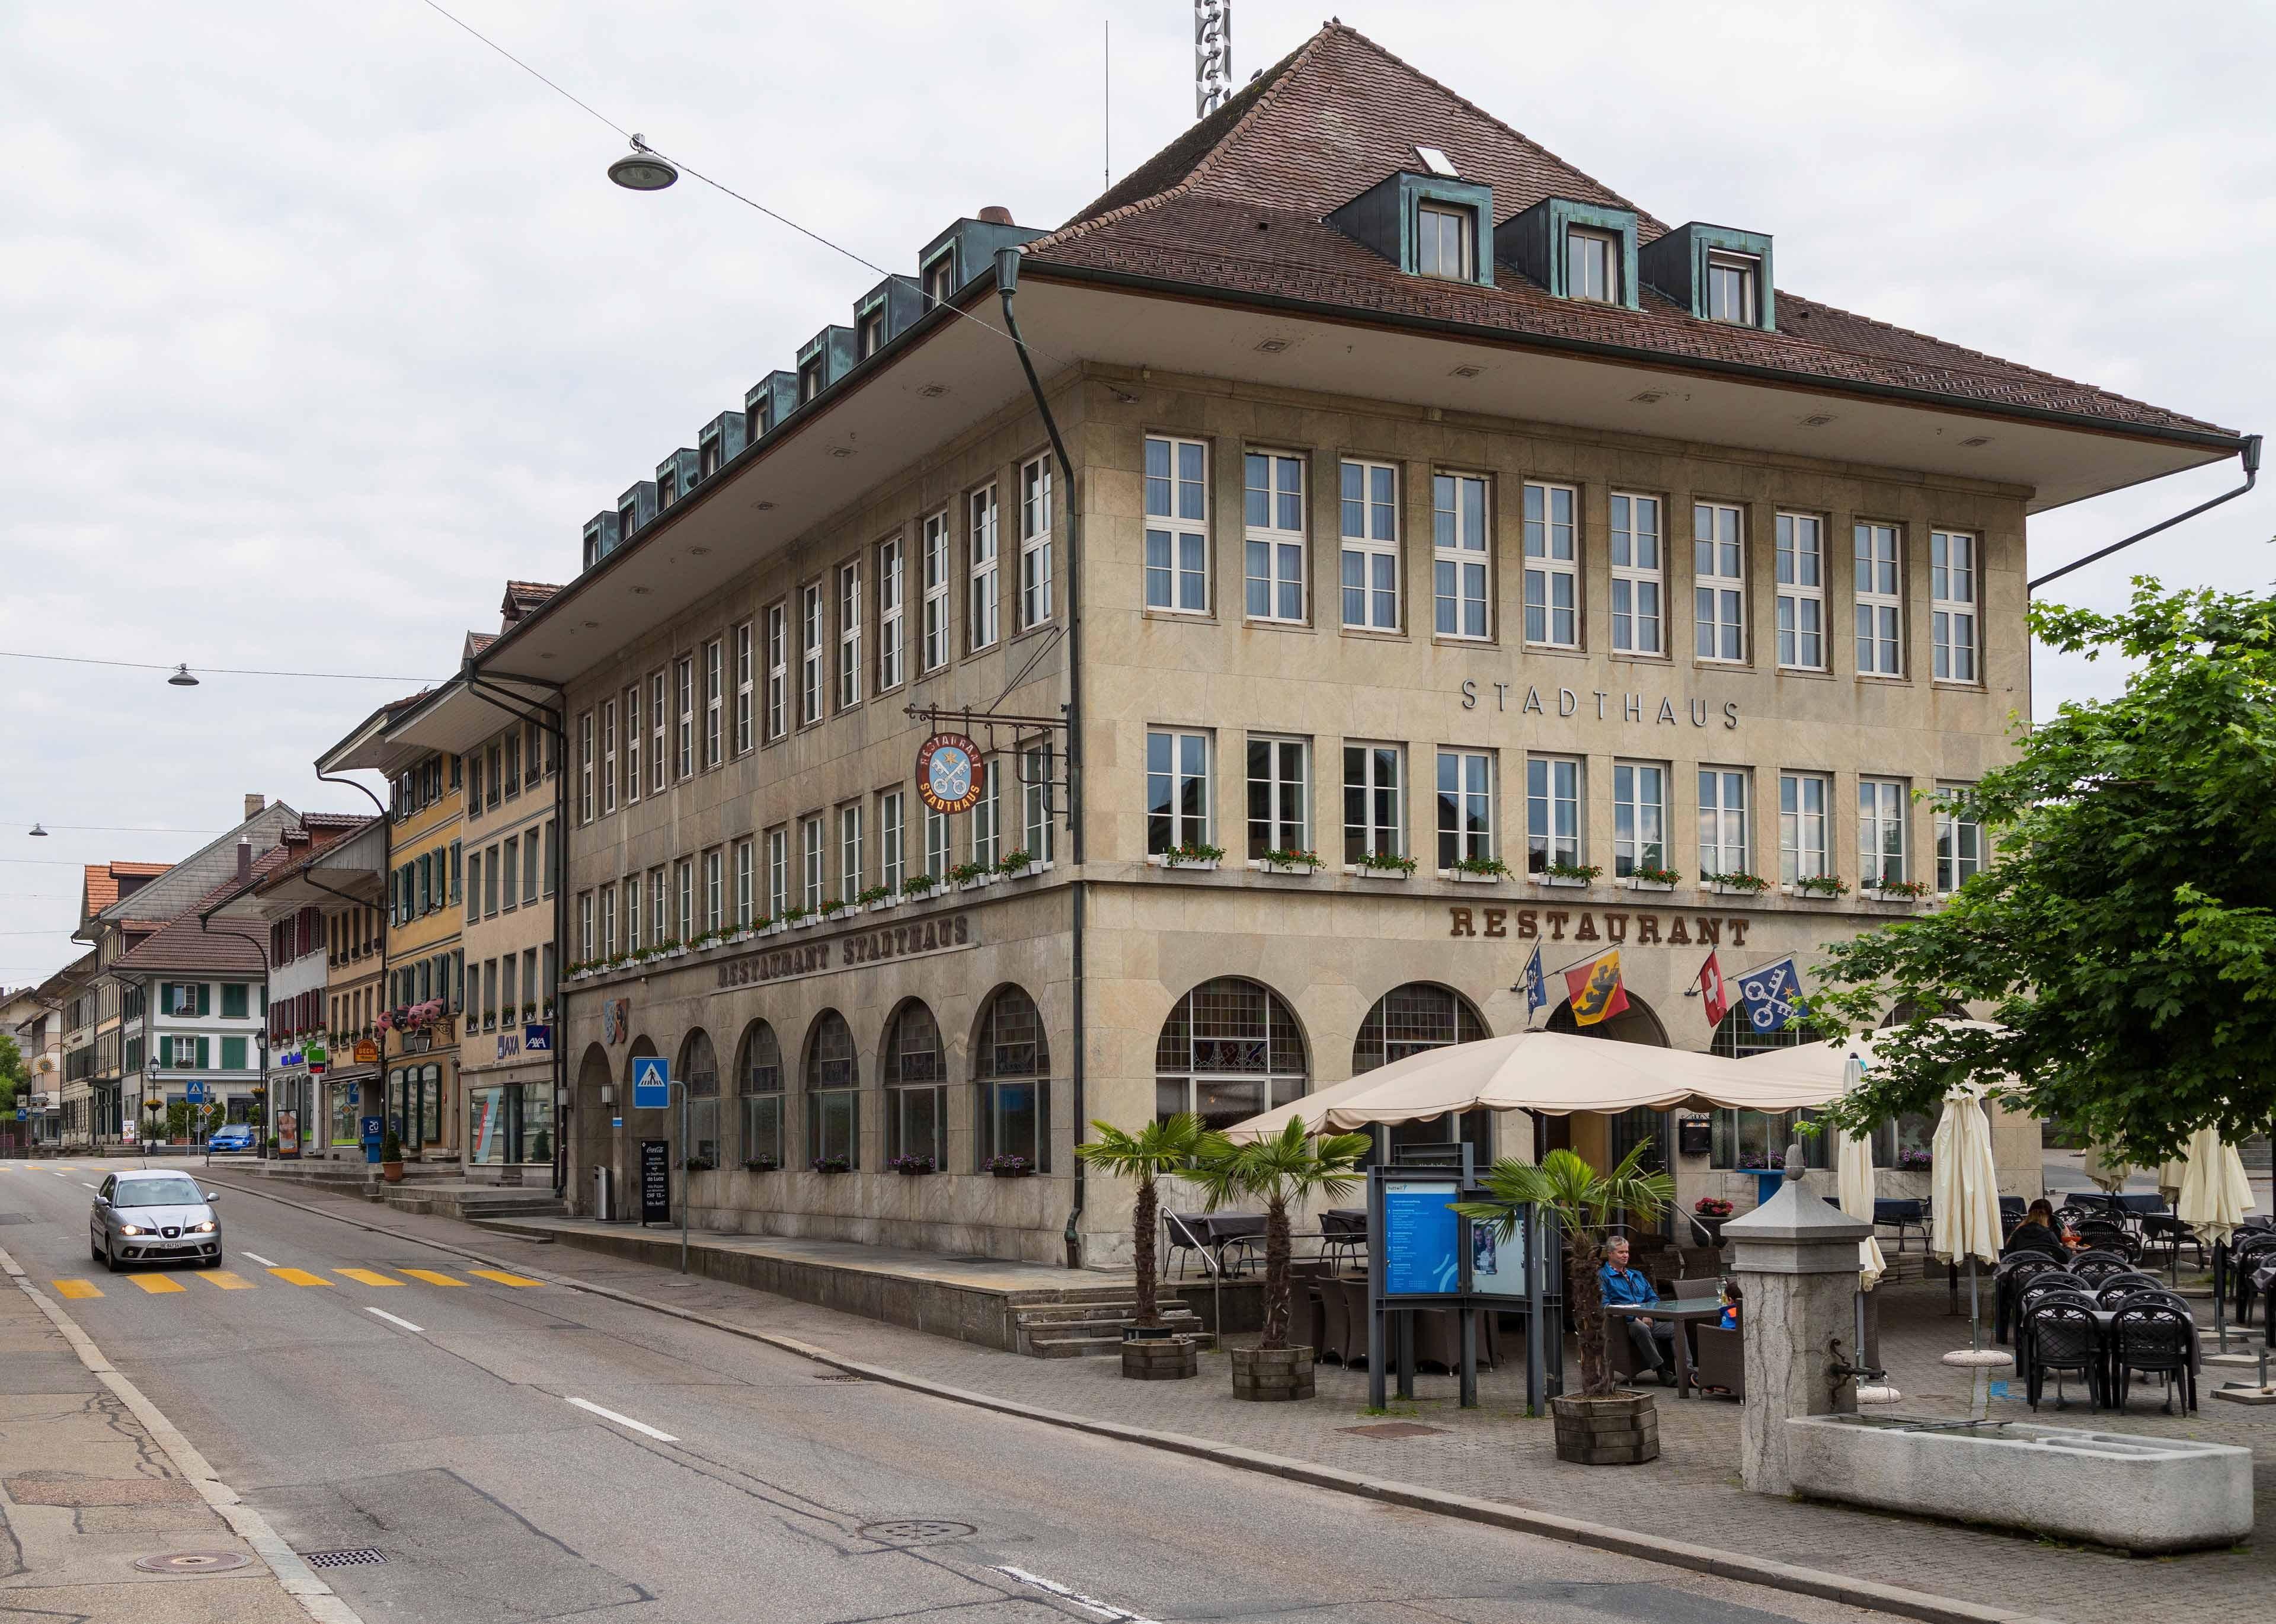 Huttwil Stadthaus